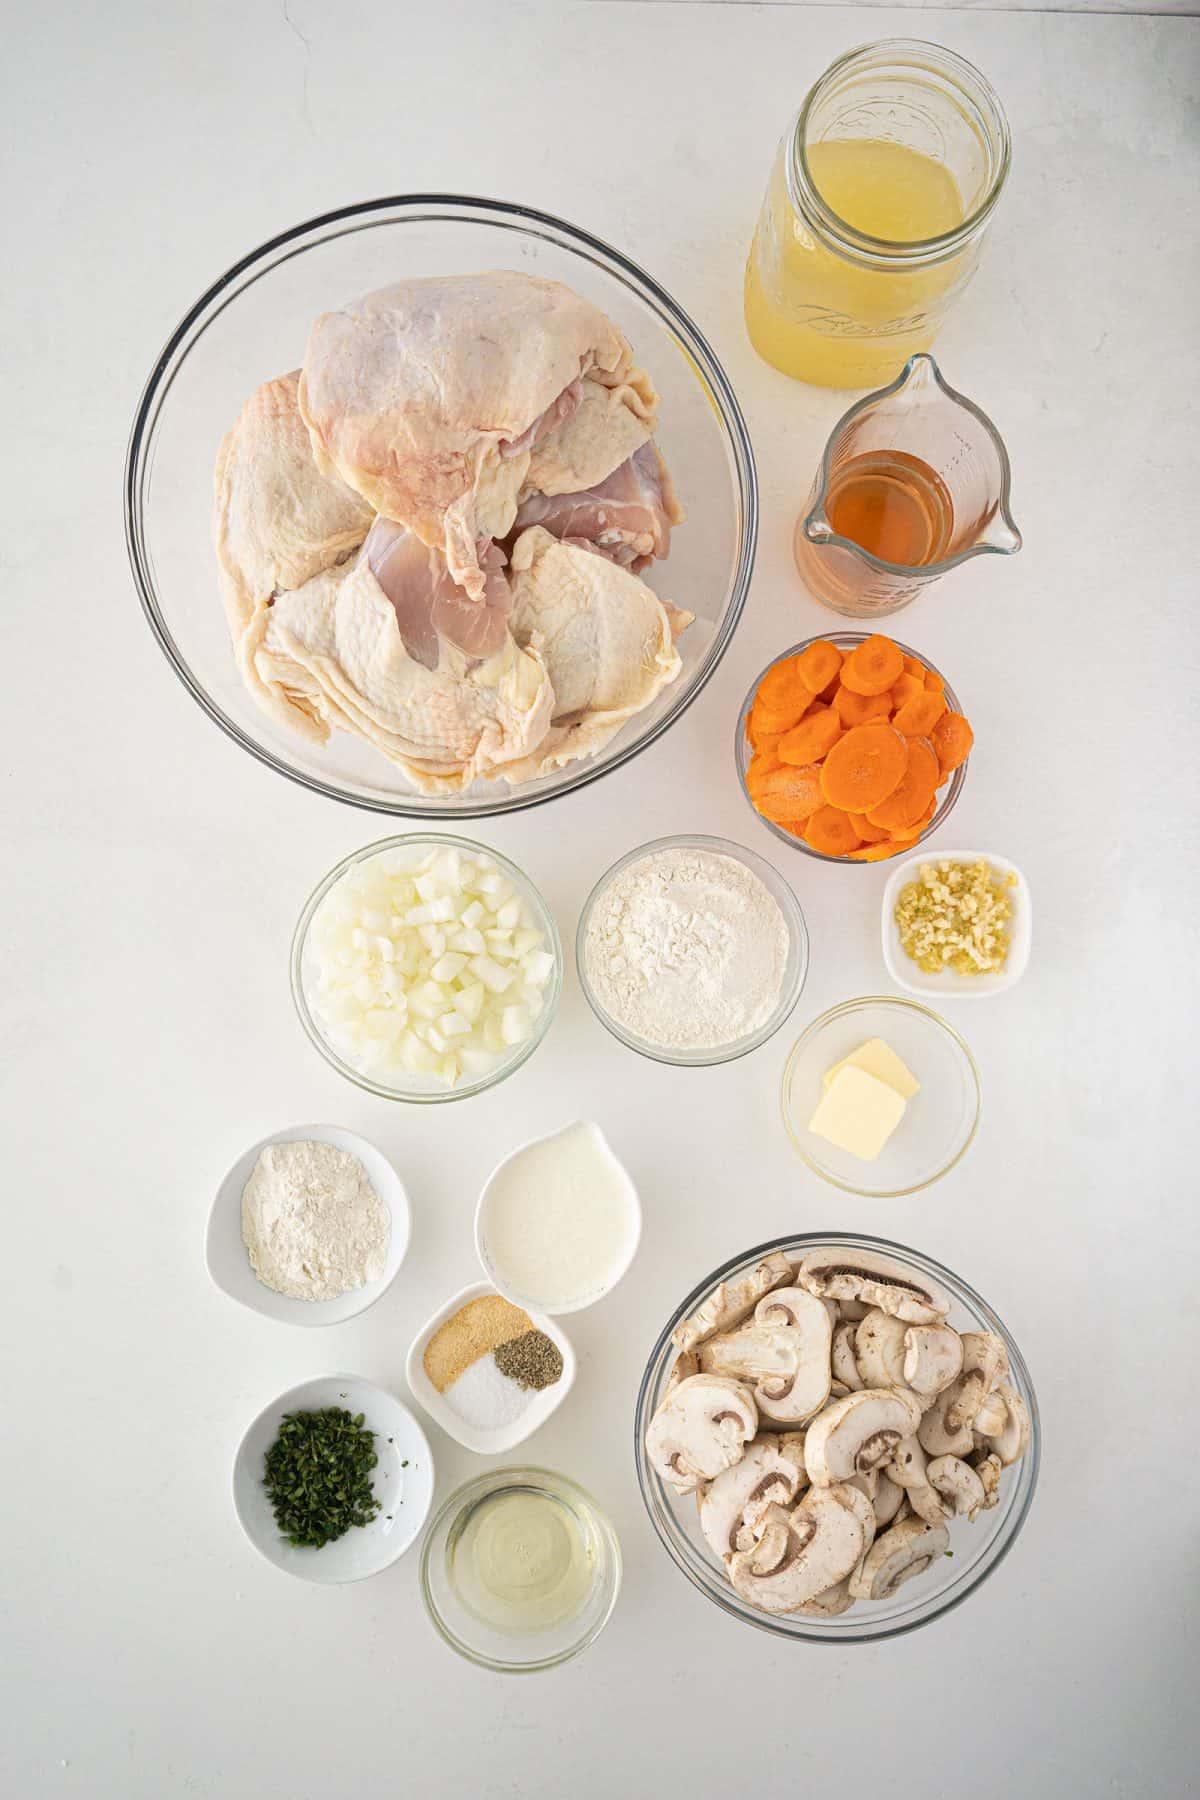 ingredients for Chicken Fricassee